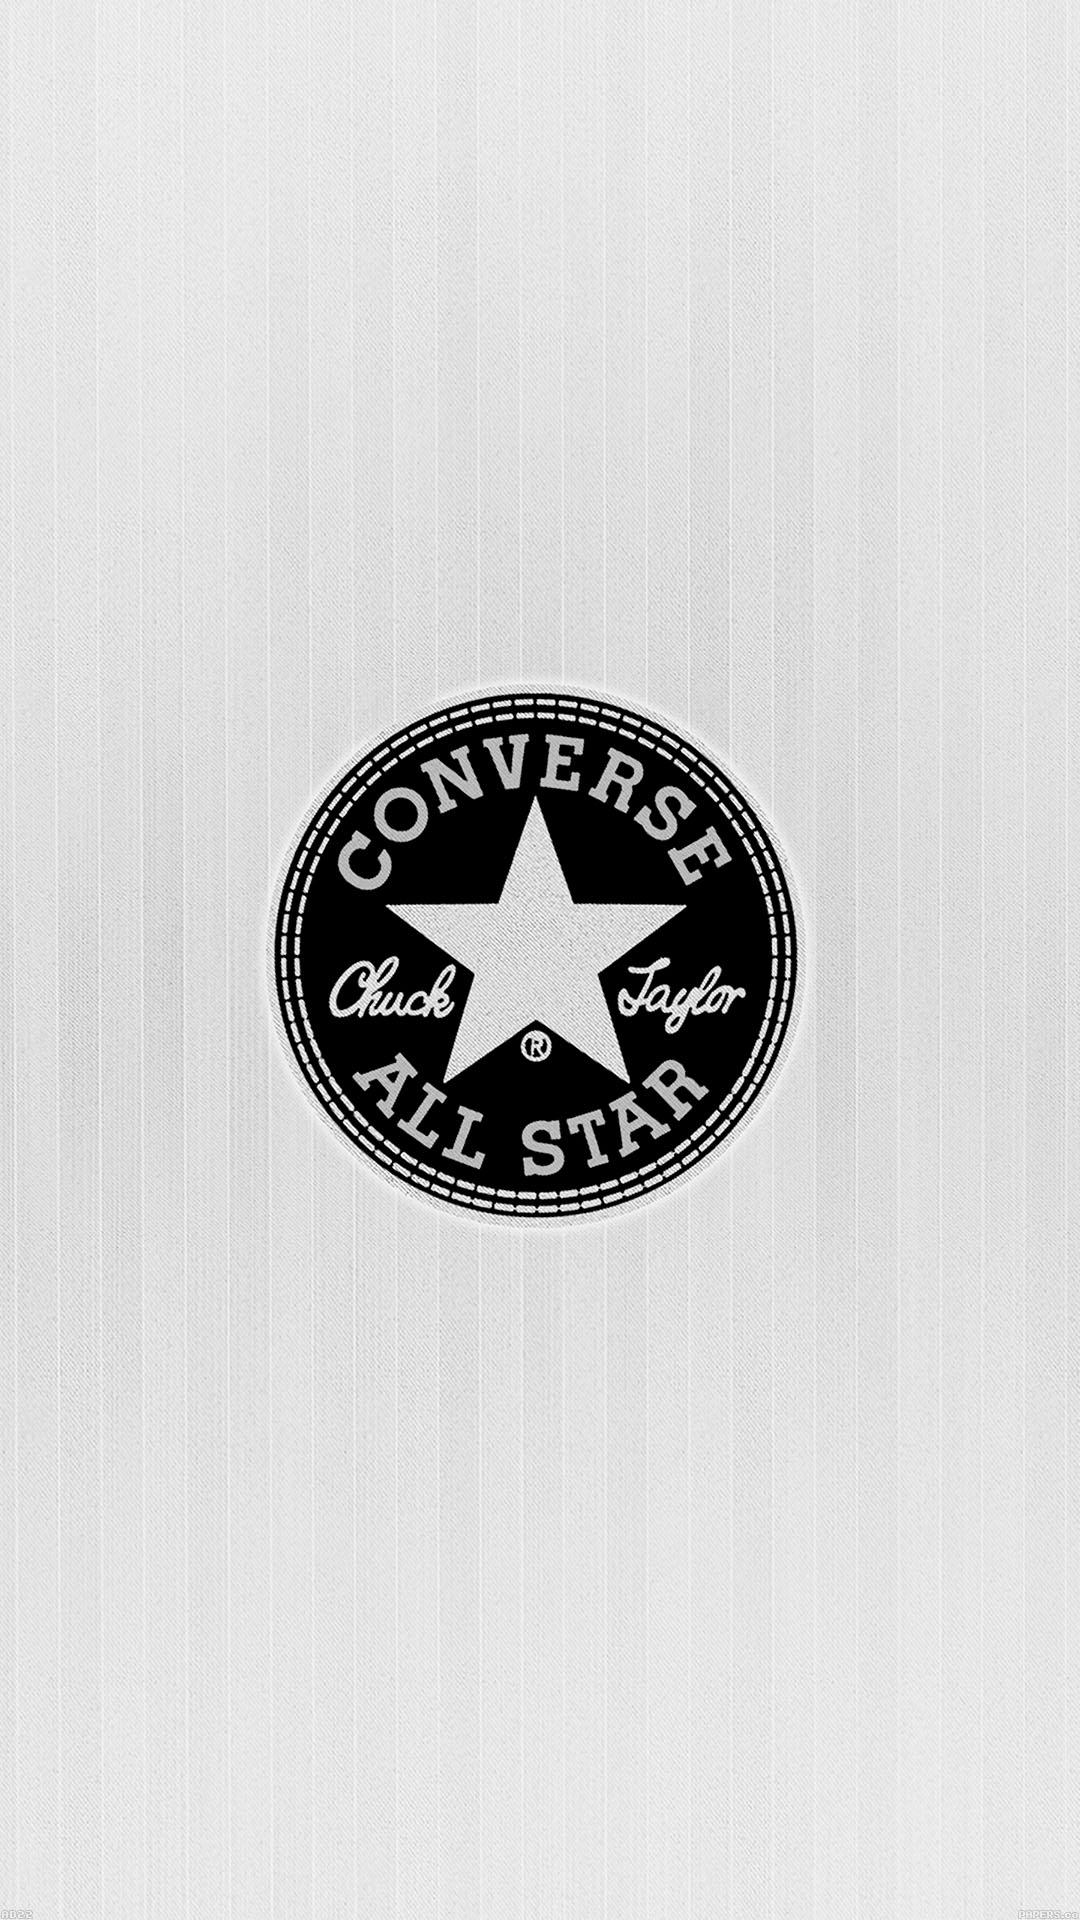 Cute Lock Screen Wallpaper Iphone Ad22 Converse Allstar Logo White Papers Co